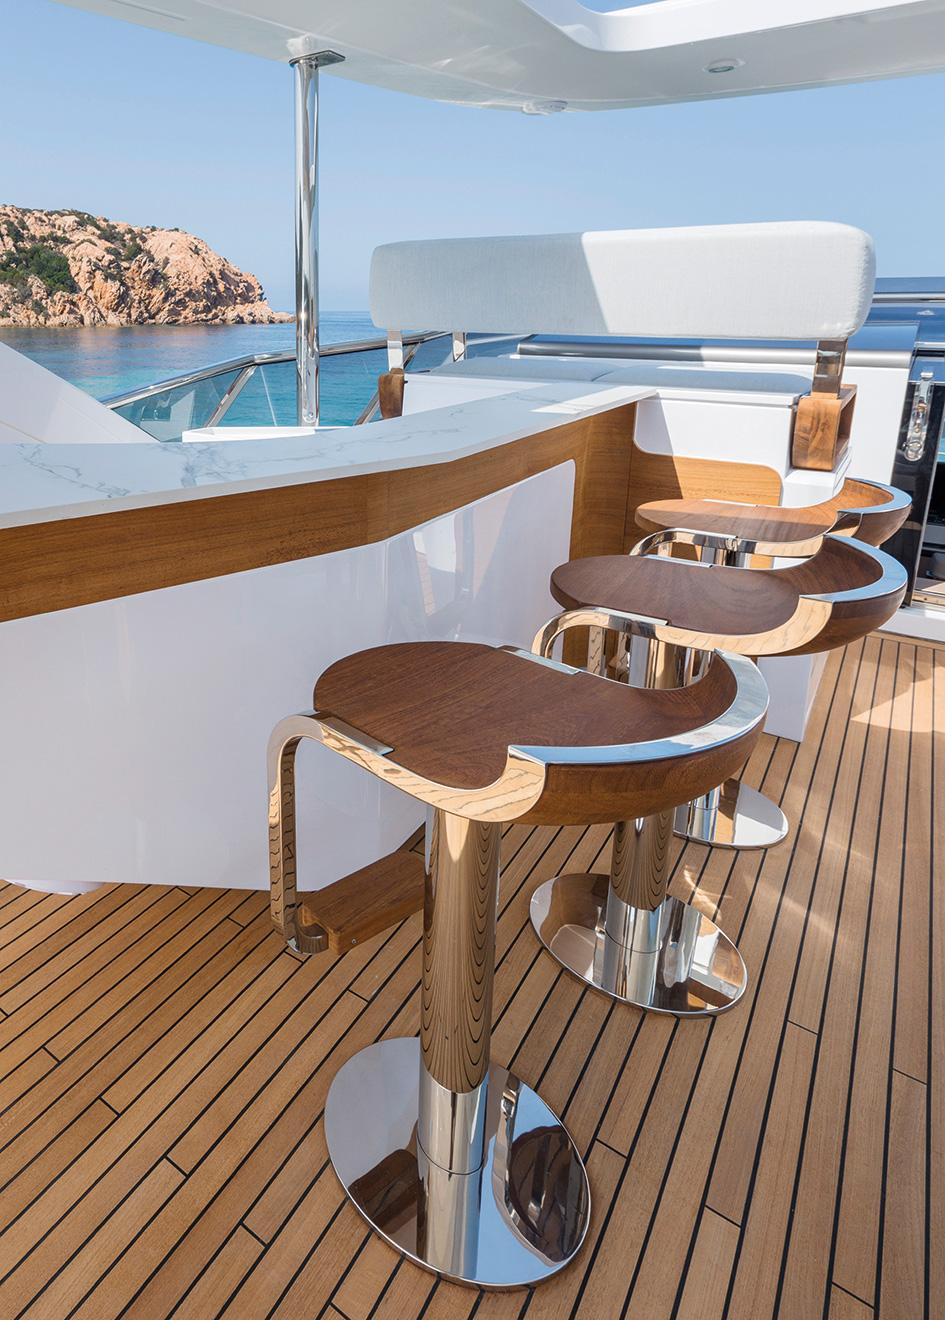 the-sundeck-bar-of-the-azimut-grande-27m-yacht